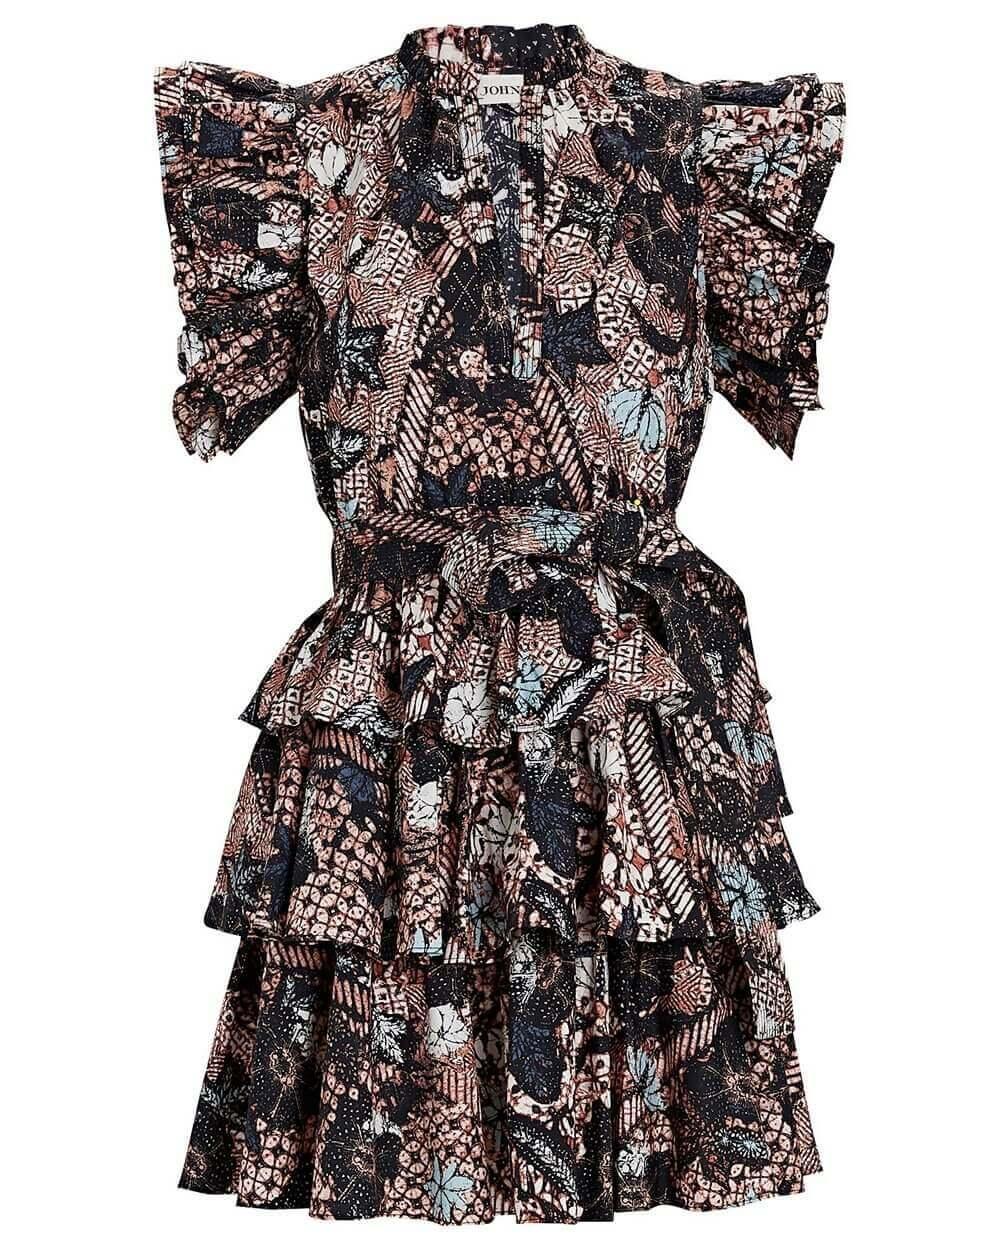 Honoria Dress